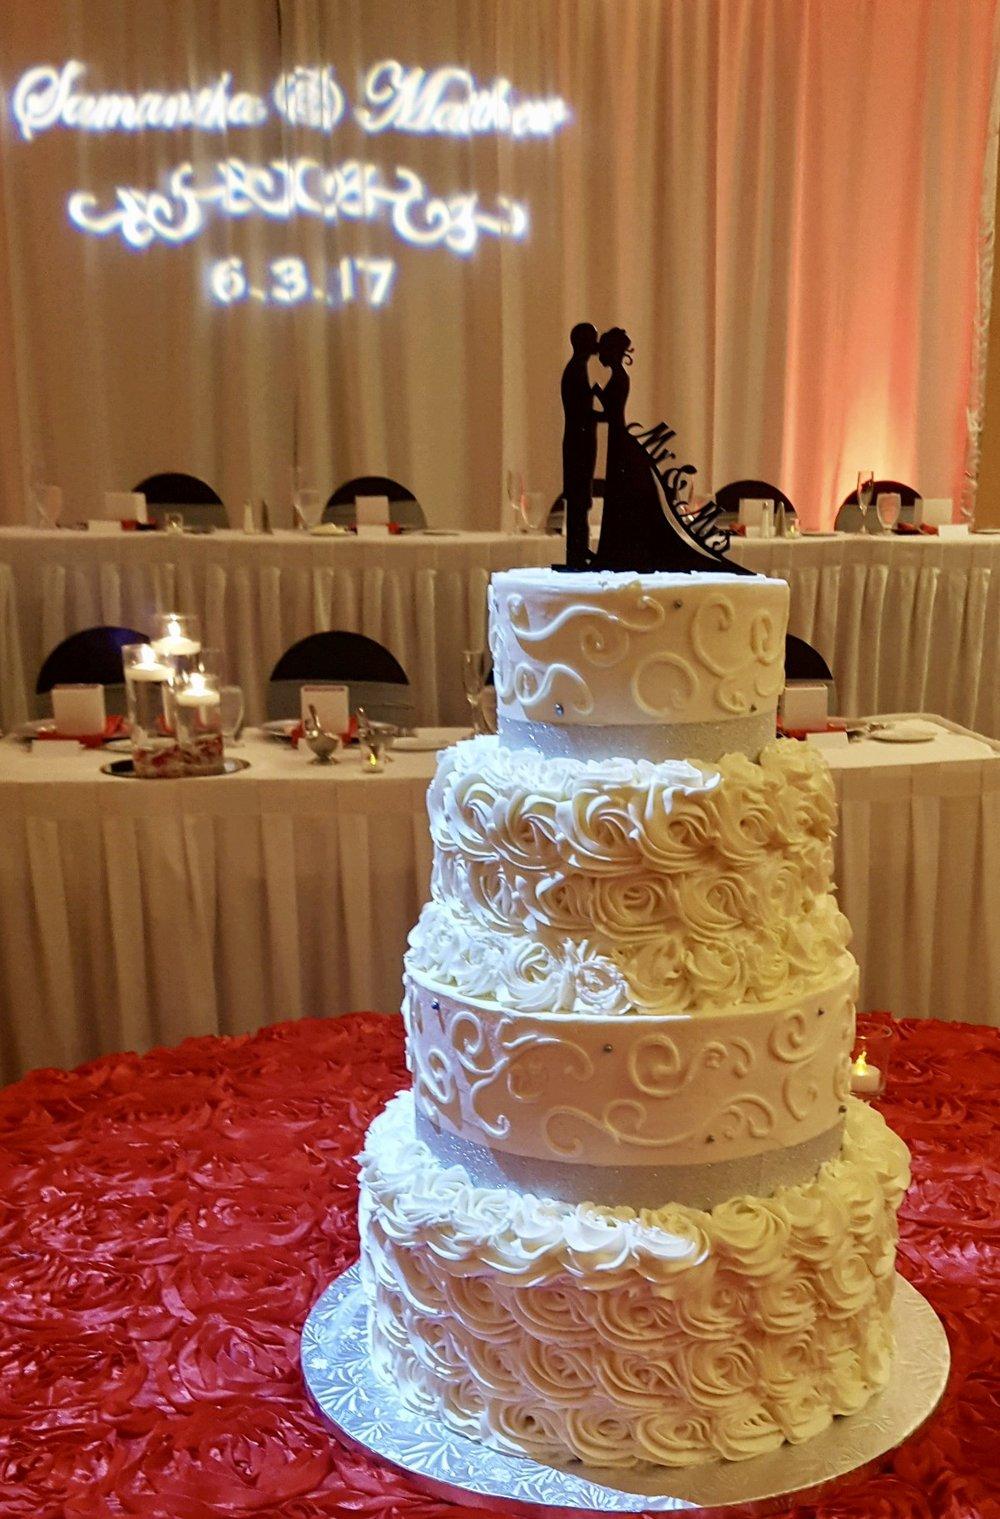 Wedding4tierscrollsandrosettes.jpg